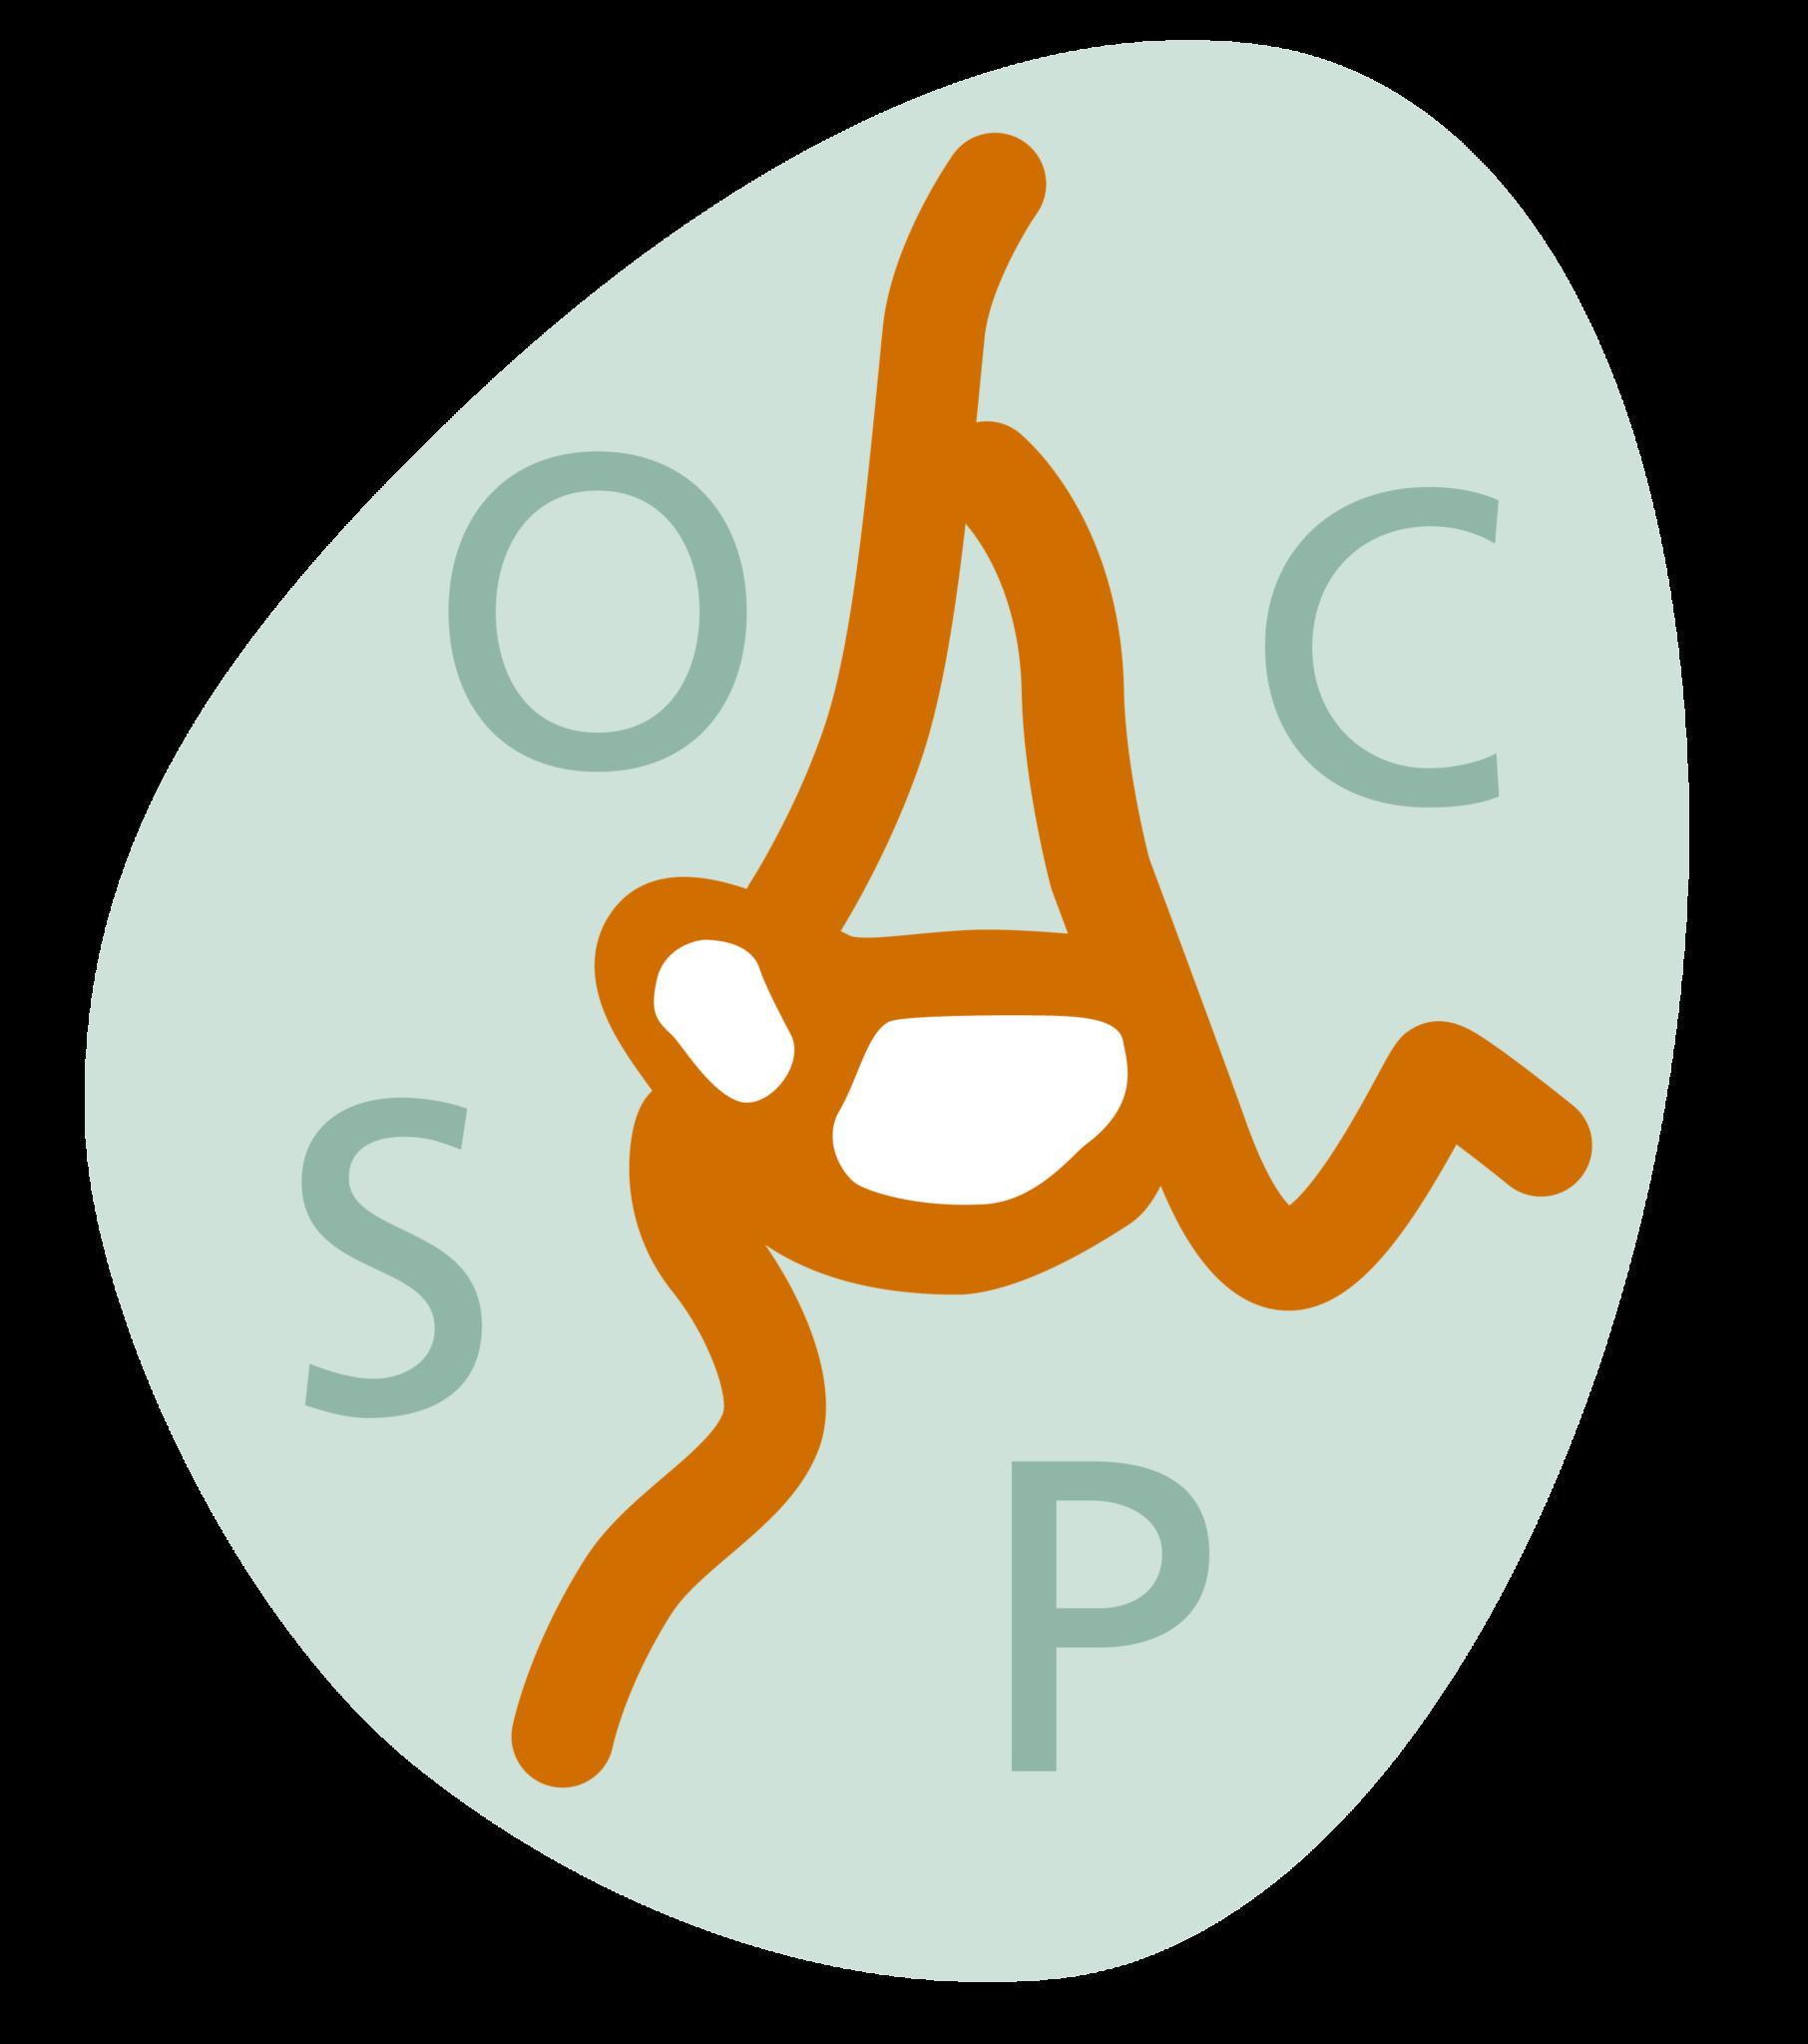 Orang Utan SOCP logo ViCAFE